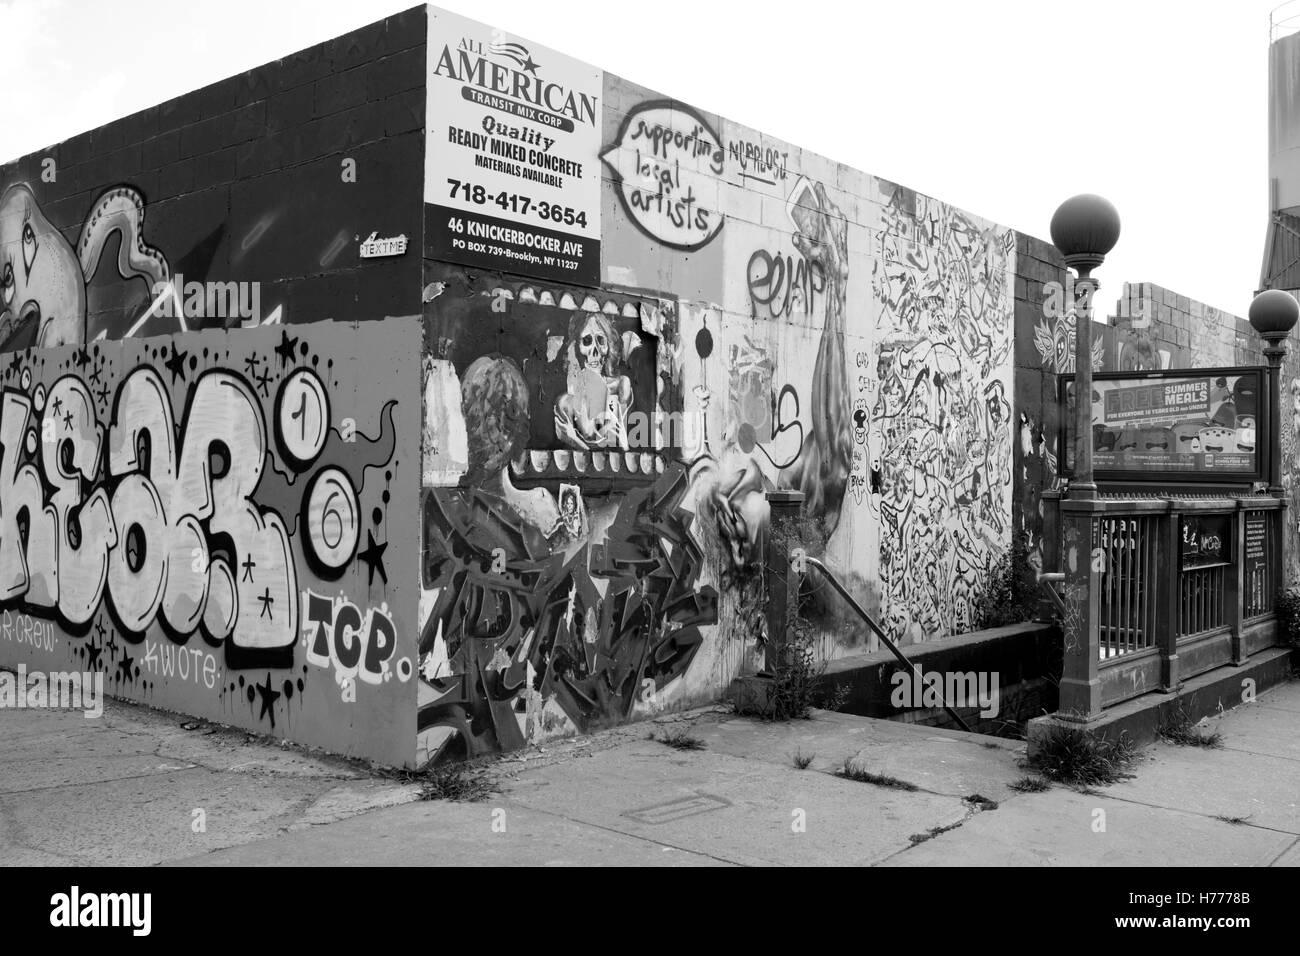 Graffiti wall usa - Graffiti Wall Mural Street Art Along Meserole St In The East Williamsburg Brunswick Section Of Brooklyn New York City Usa